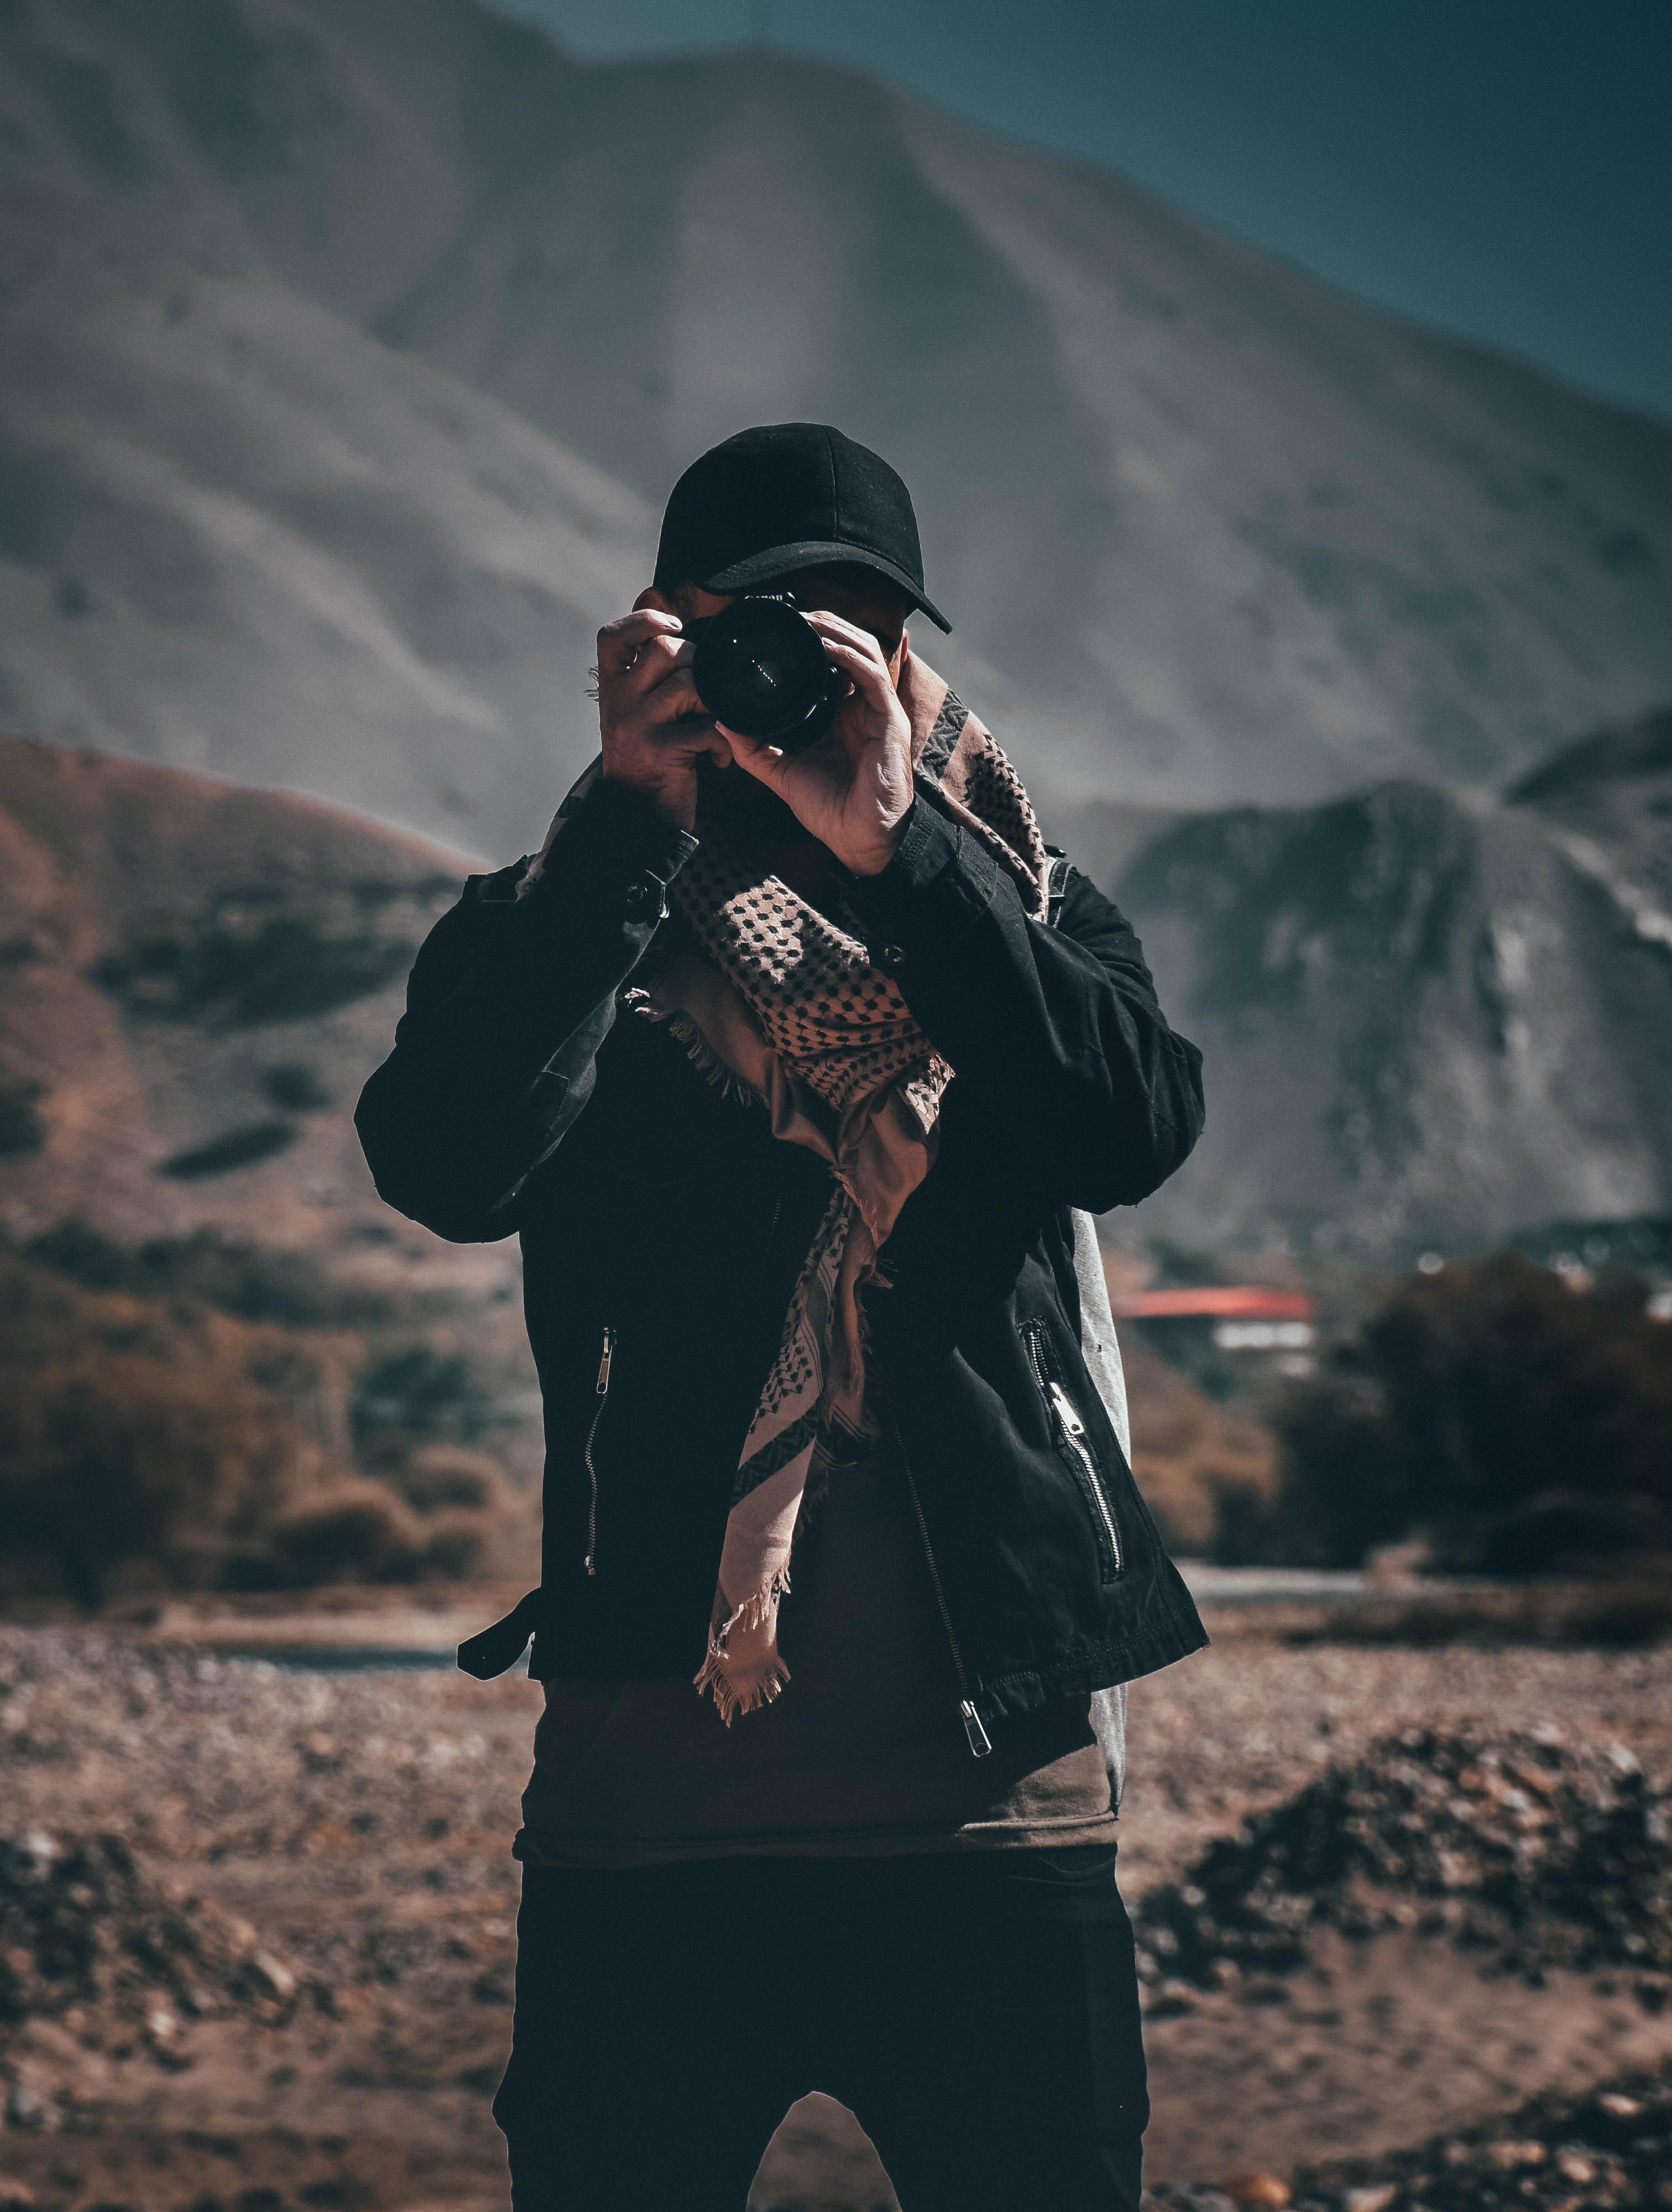 person-holding-camera-1704488